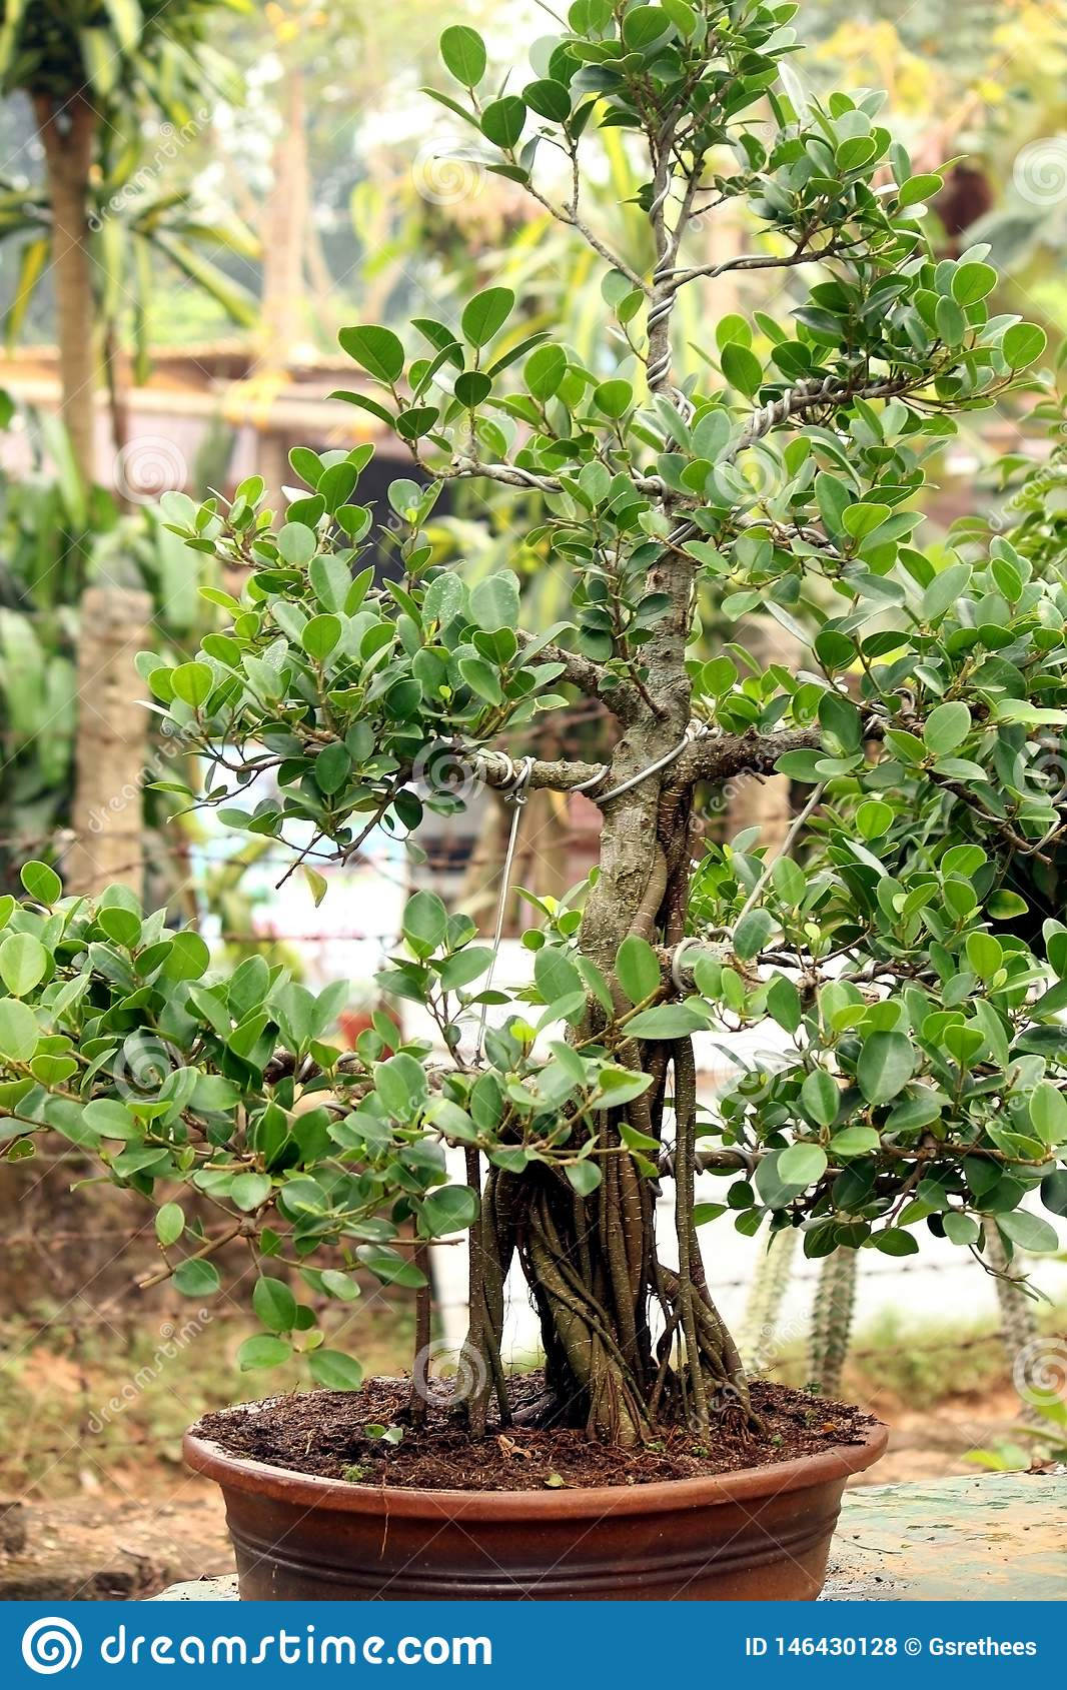 Bonsai Tree In Pots Stock Photo Image Of Plants Flowers 146430128